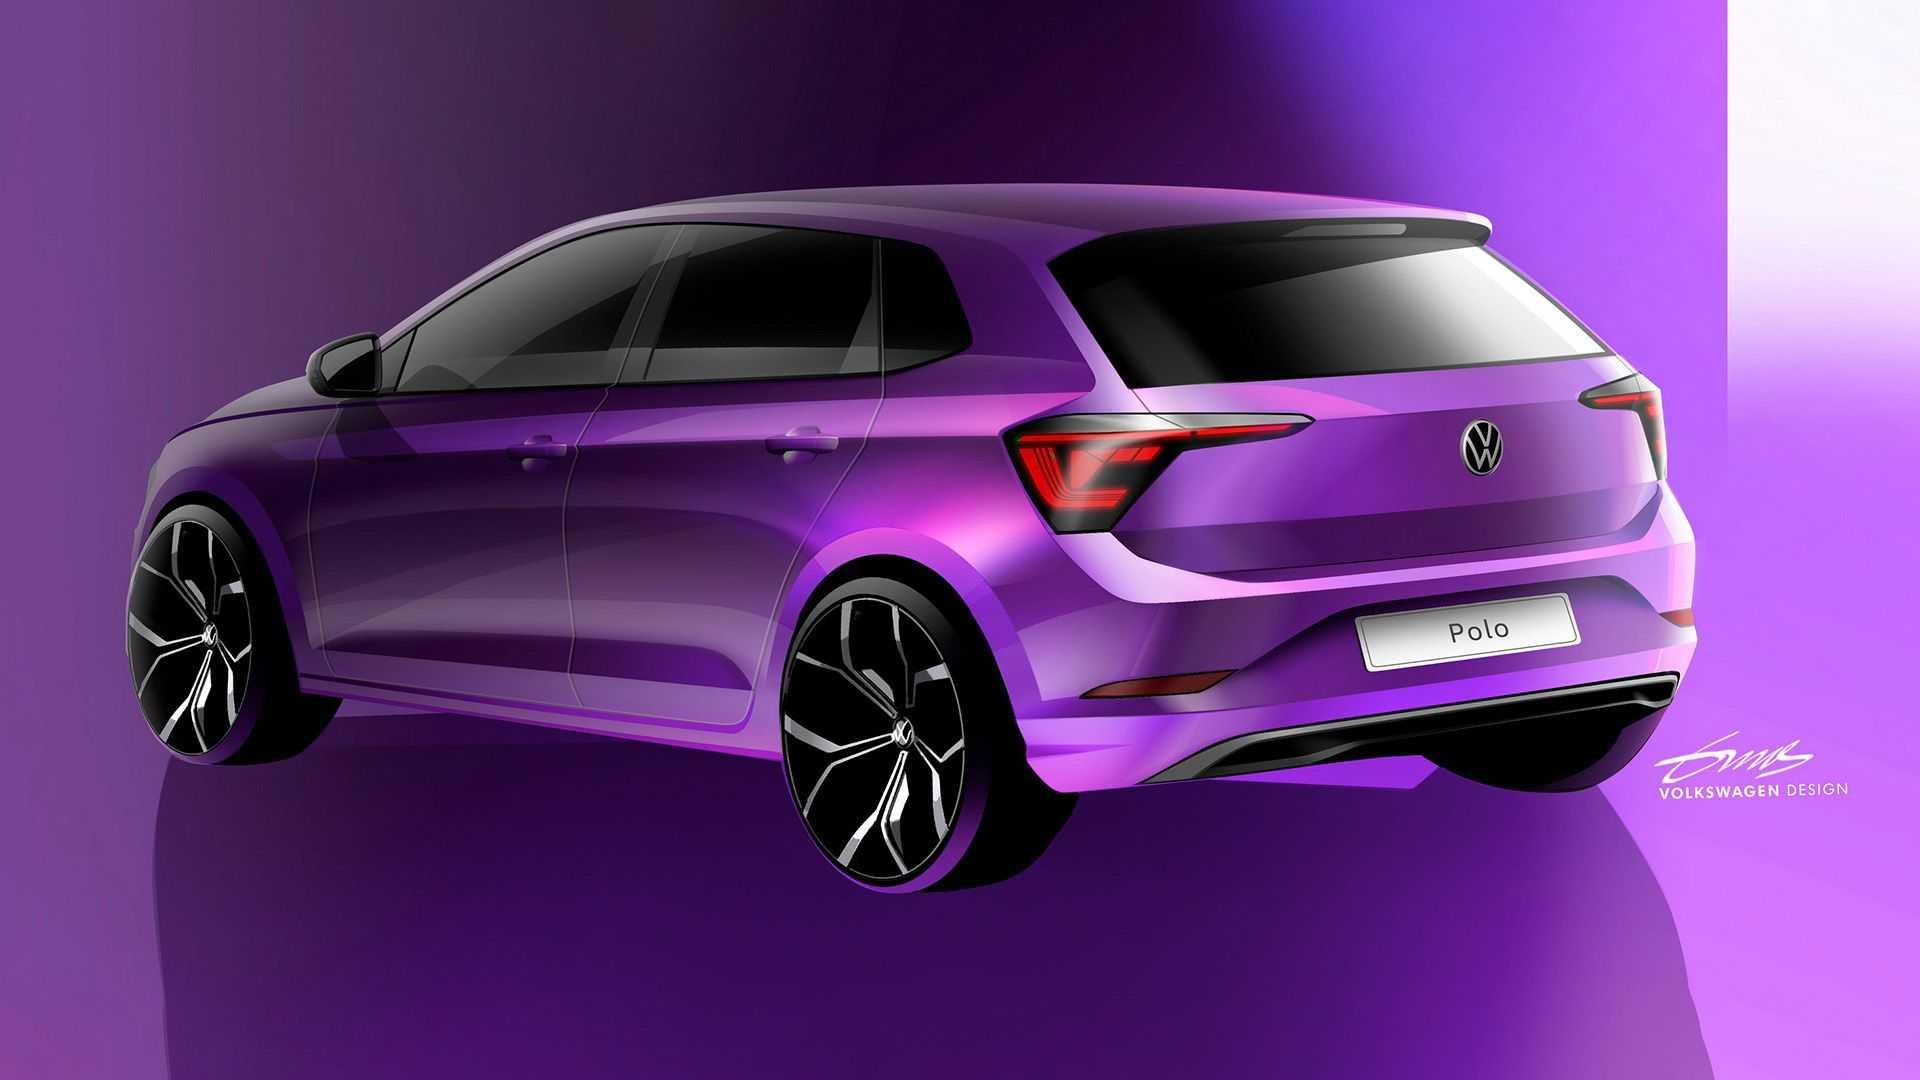 Volkswagen-Polo-facelift-43